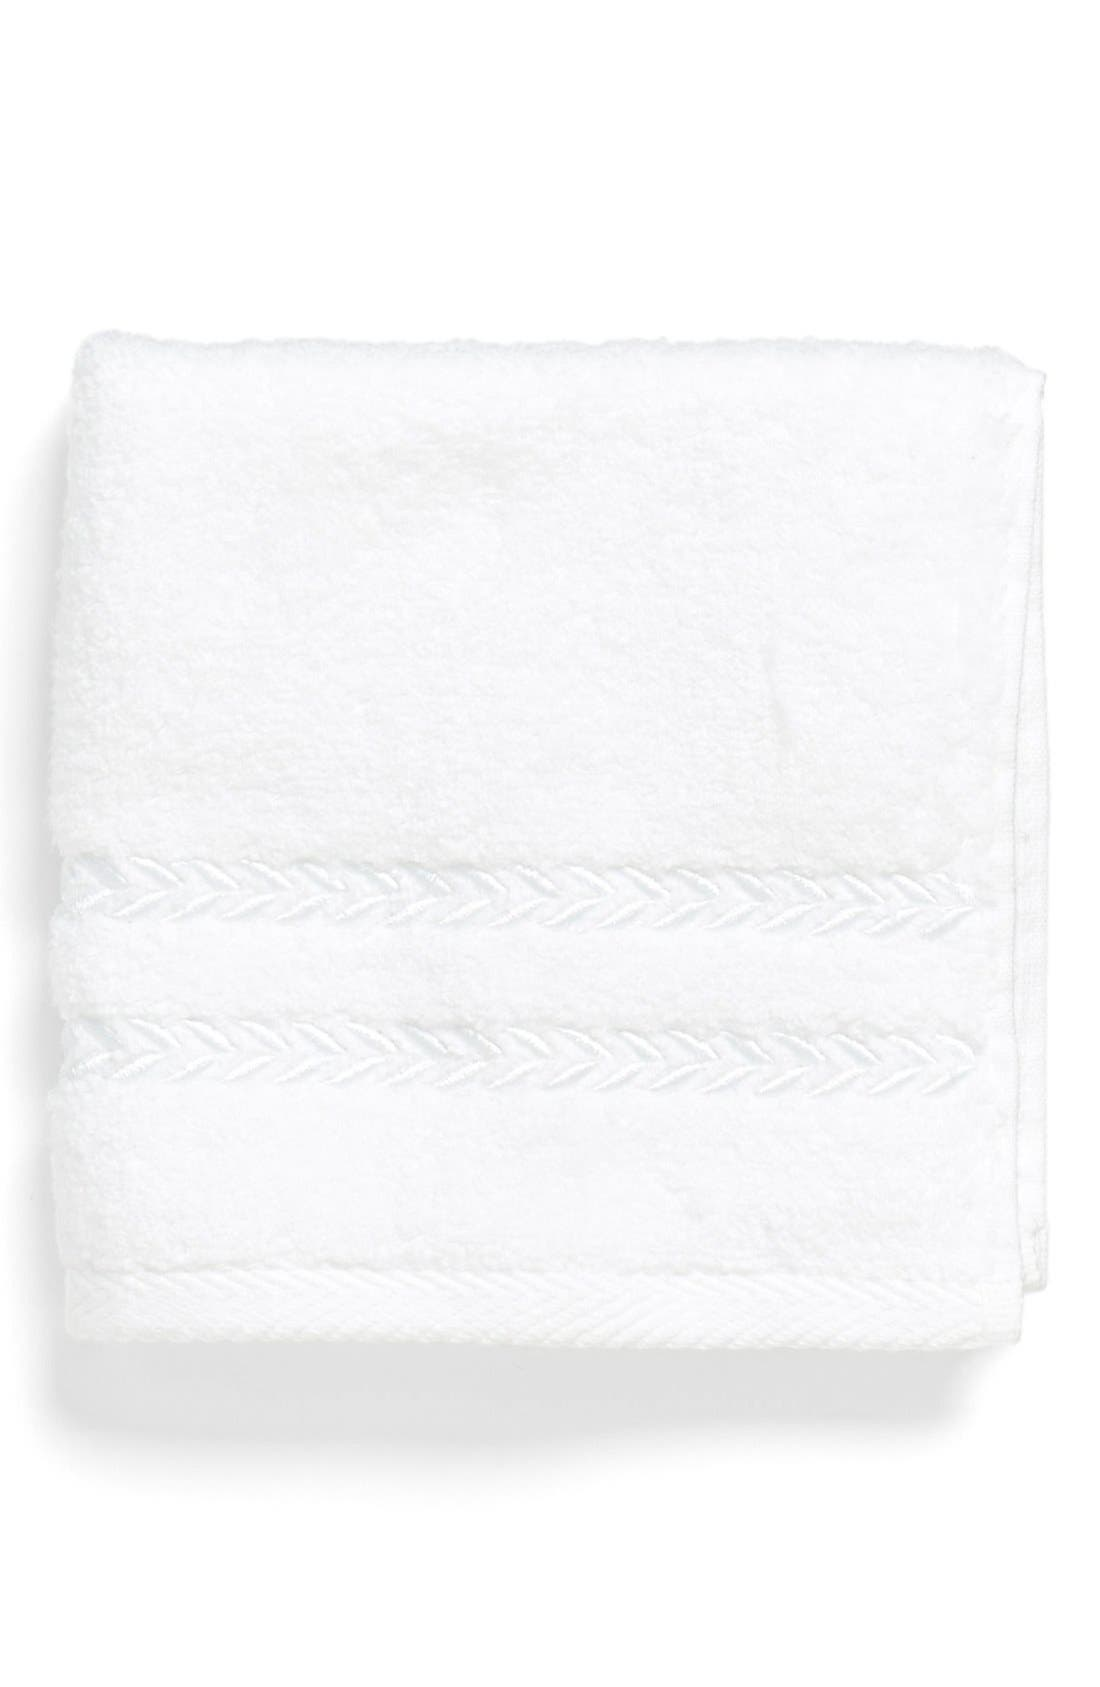 'Pearl Essence' Wash Towel,                             Main thumbnail 3, color,